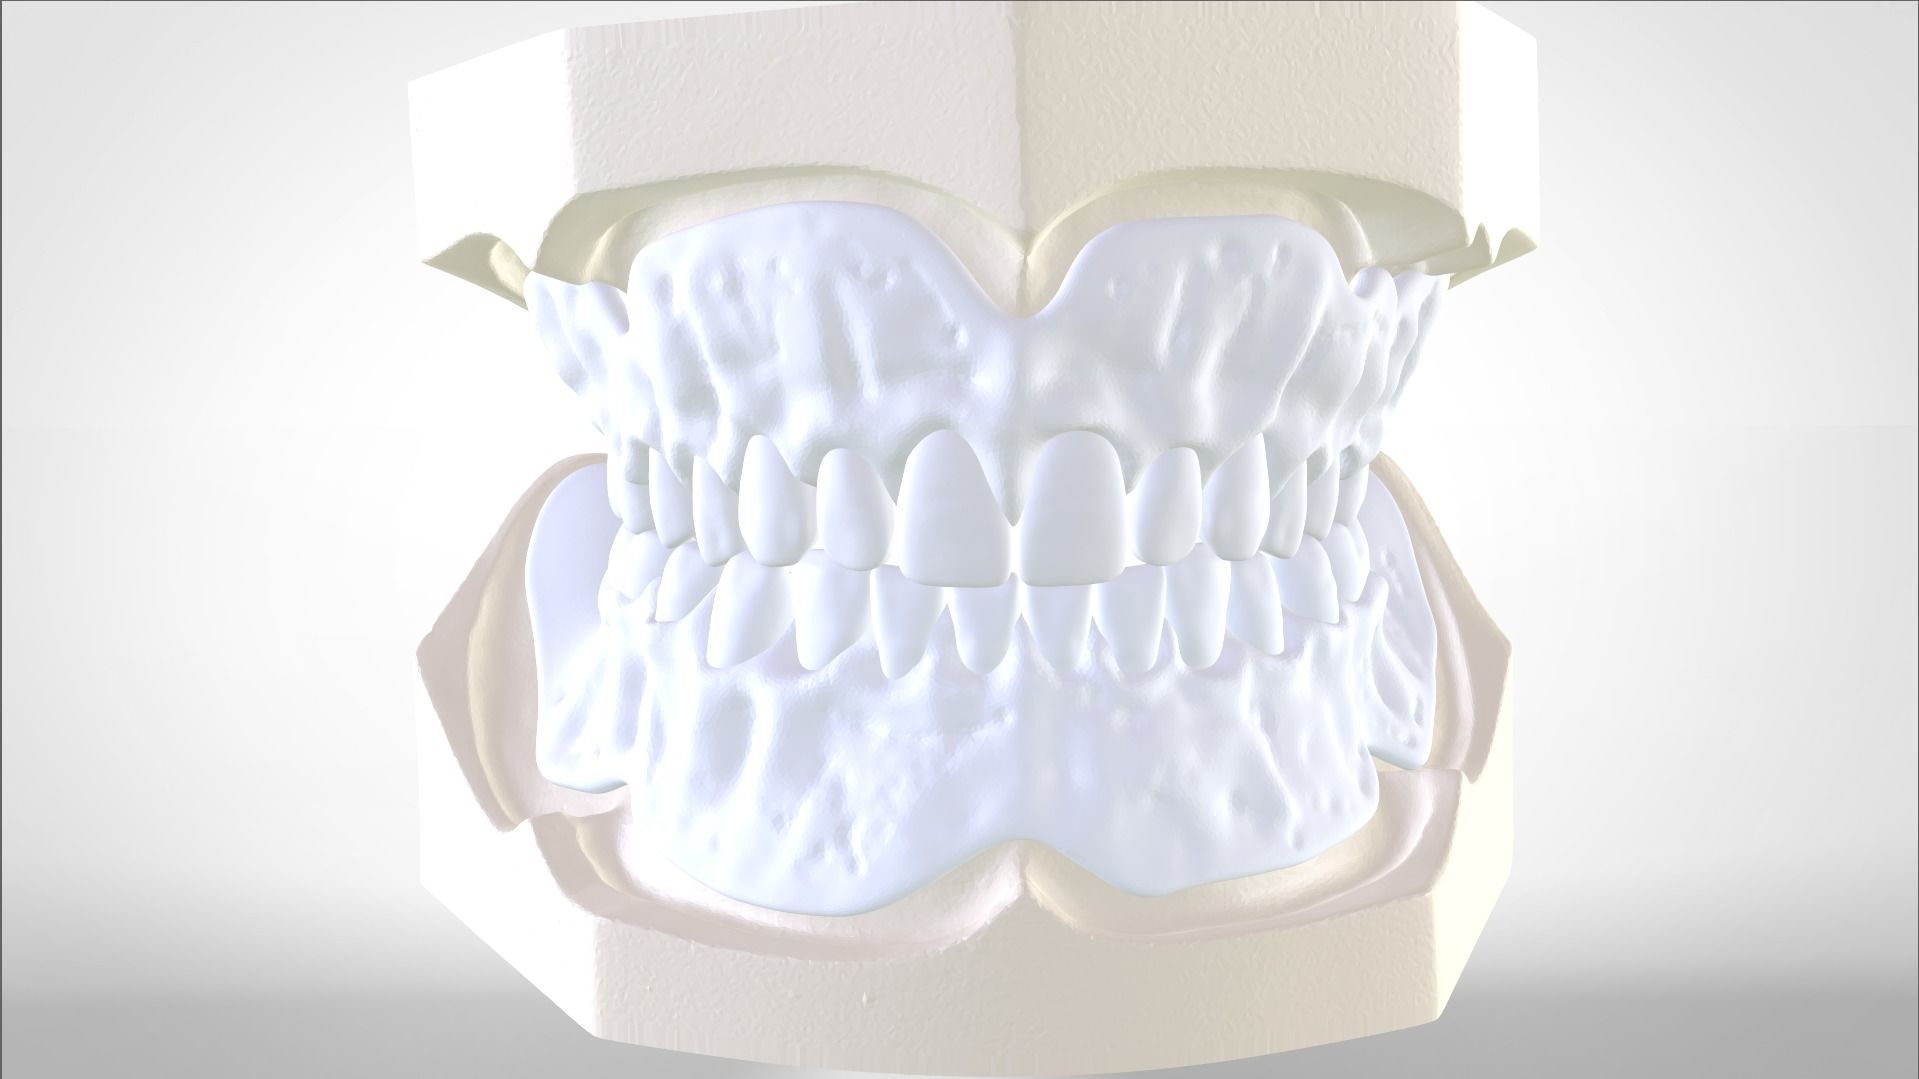 Digital Try-in Full Dentures for Injection Molding